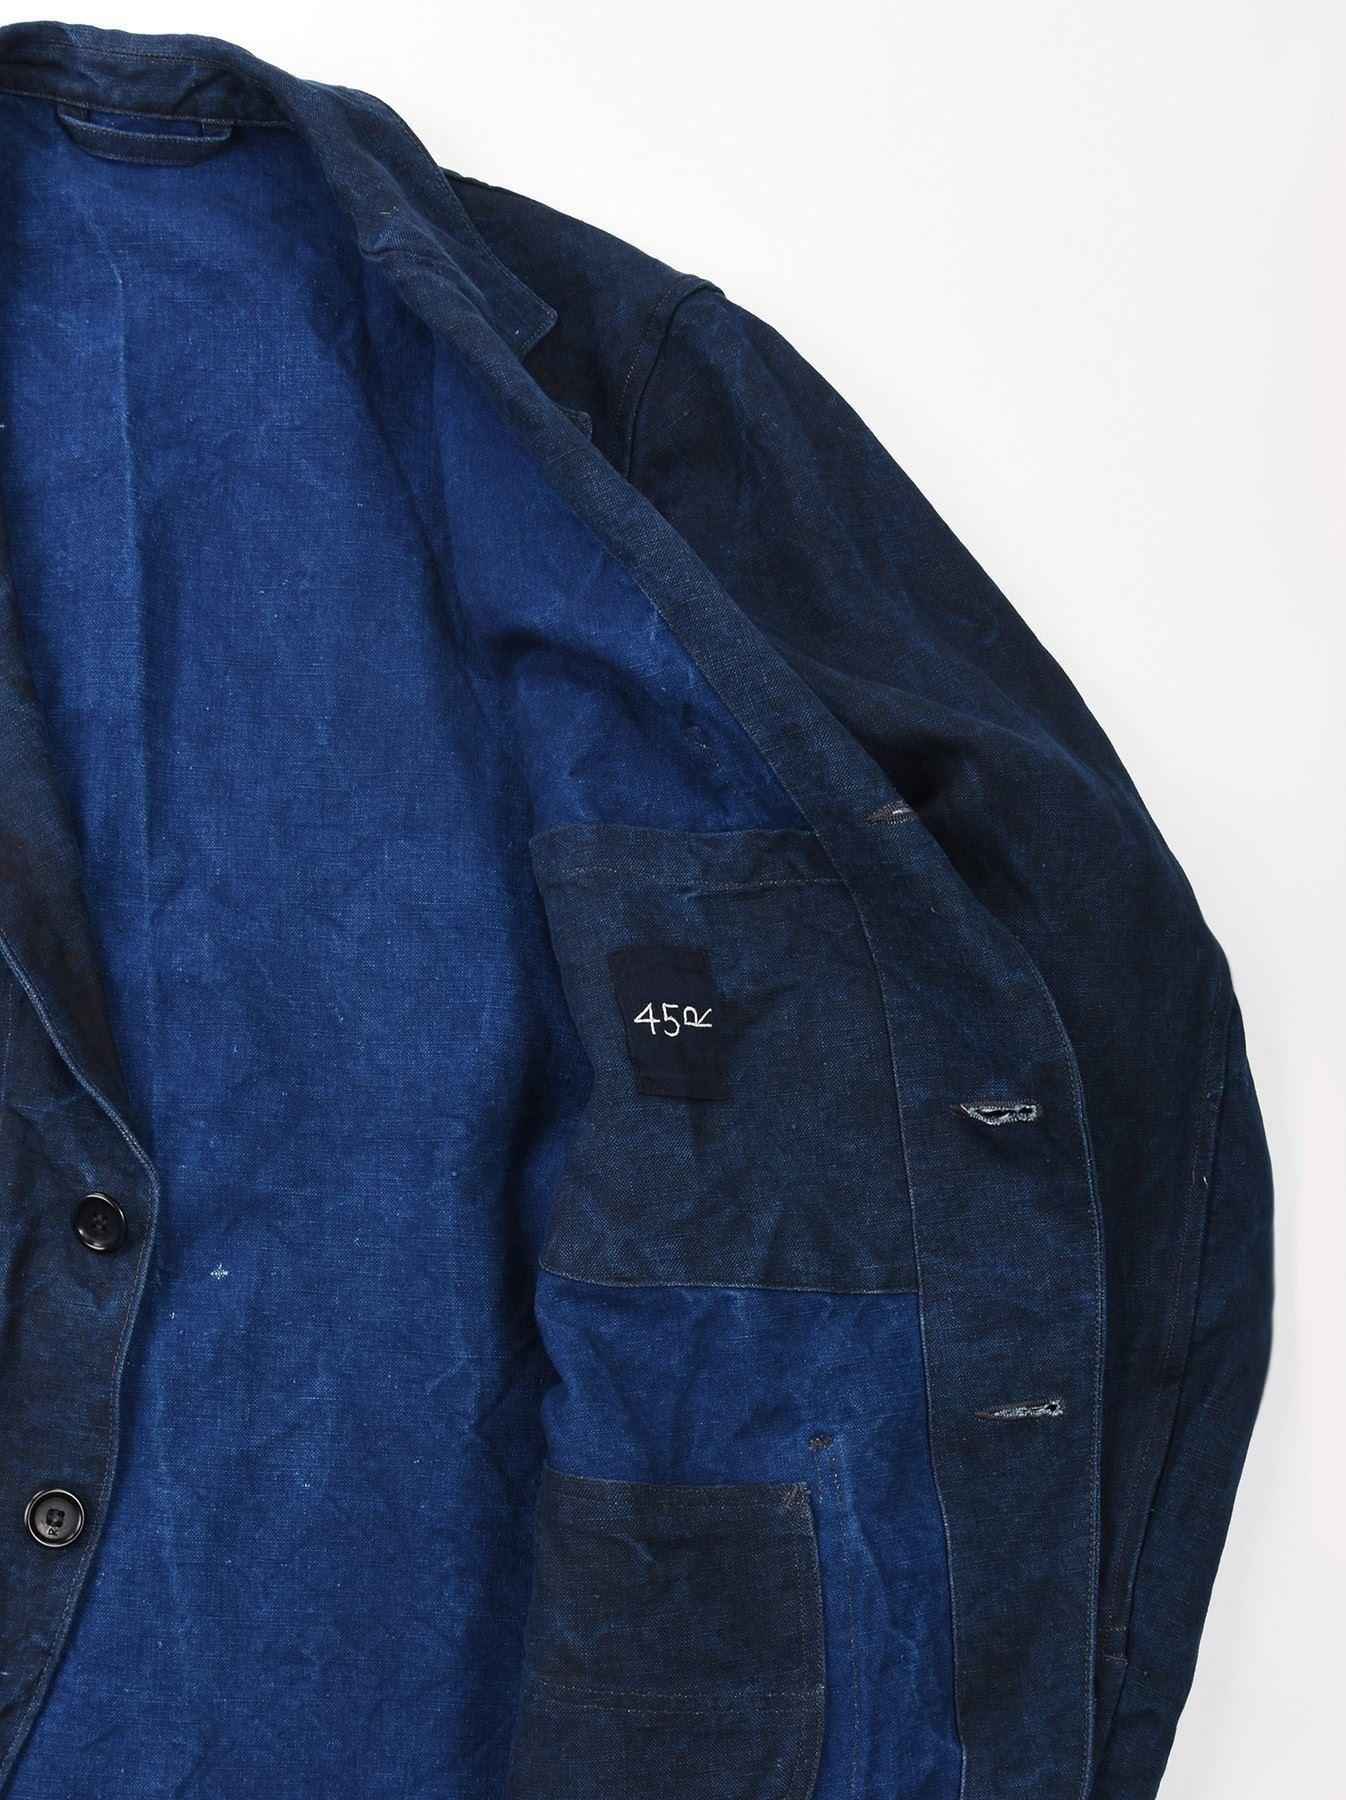 Indigo Linen Duck Asama Jacket-11